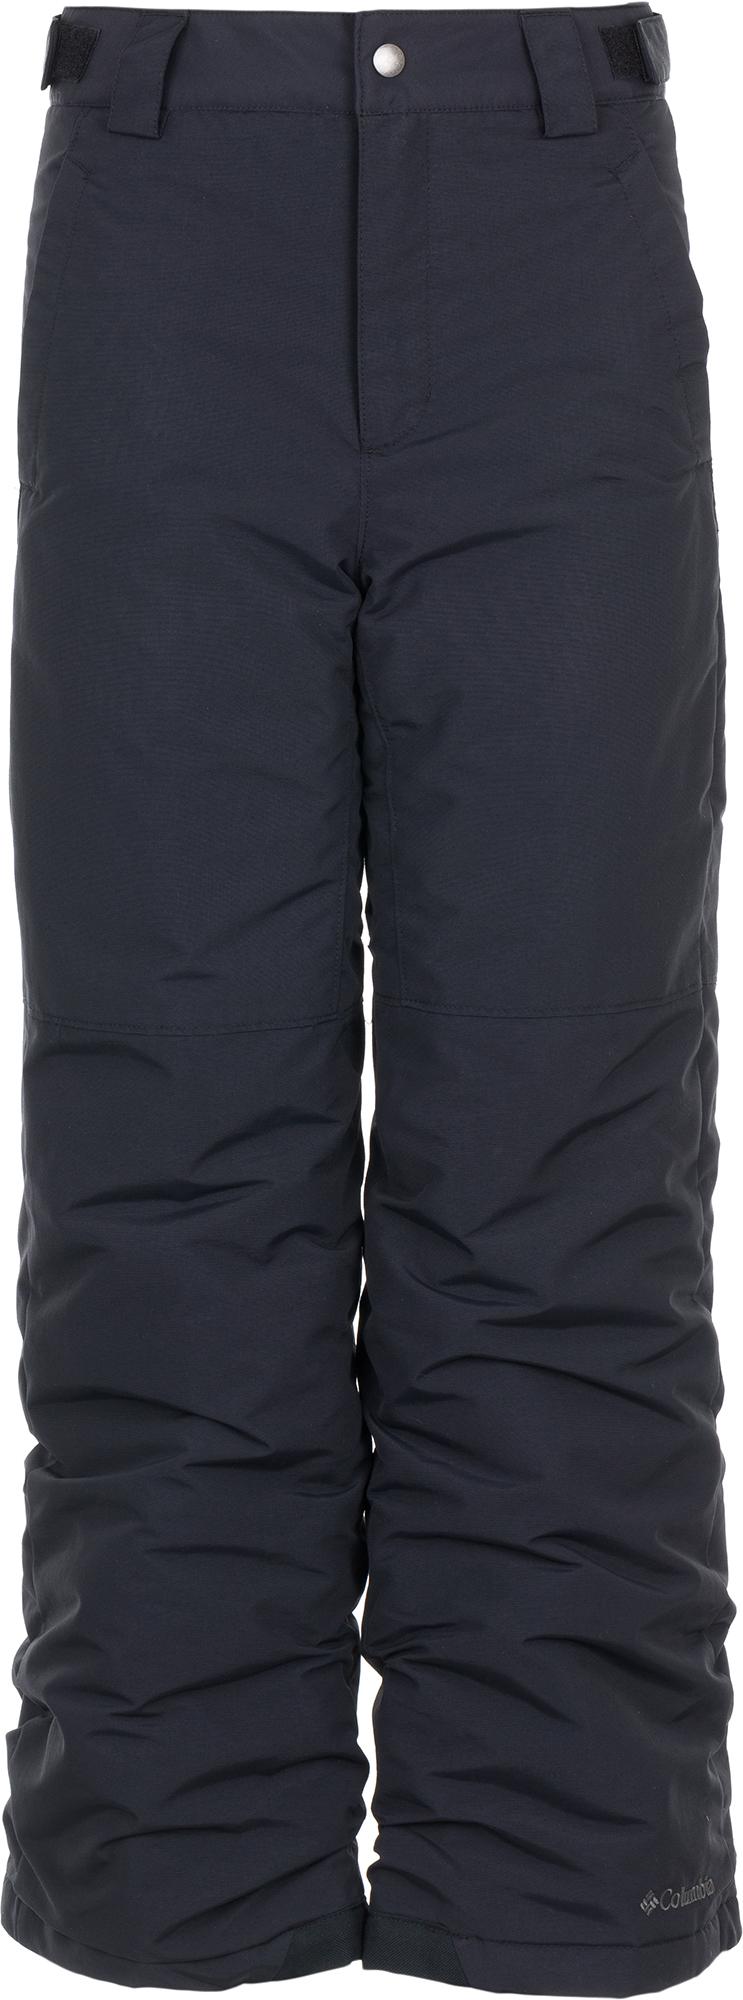 Columbia Брюки утепленные для девочек Columbia Snow Day columbia брюки утепленные мужские columbia roc